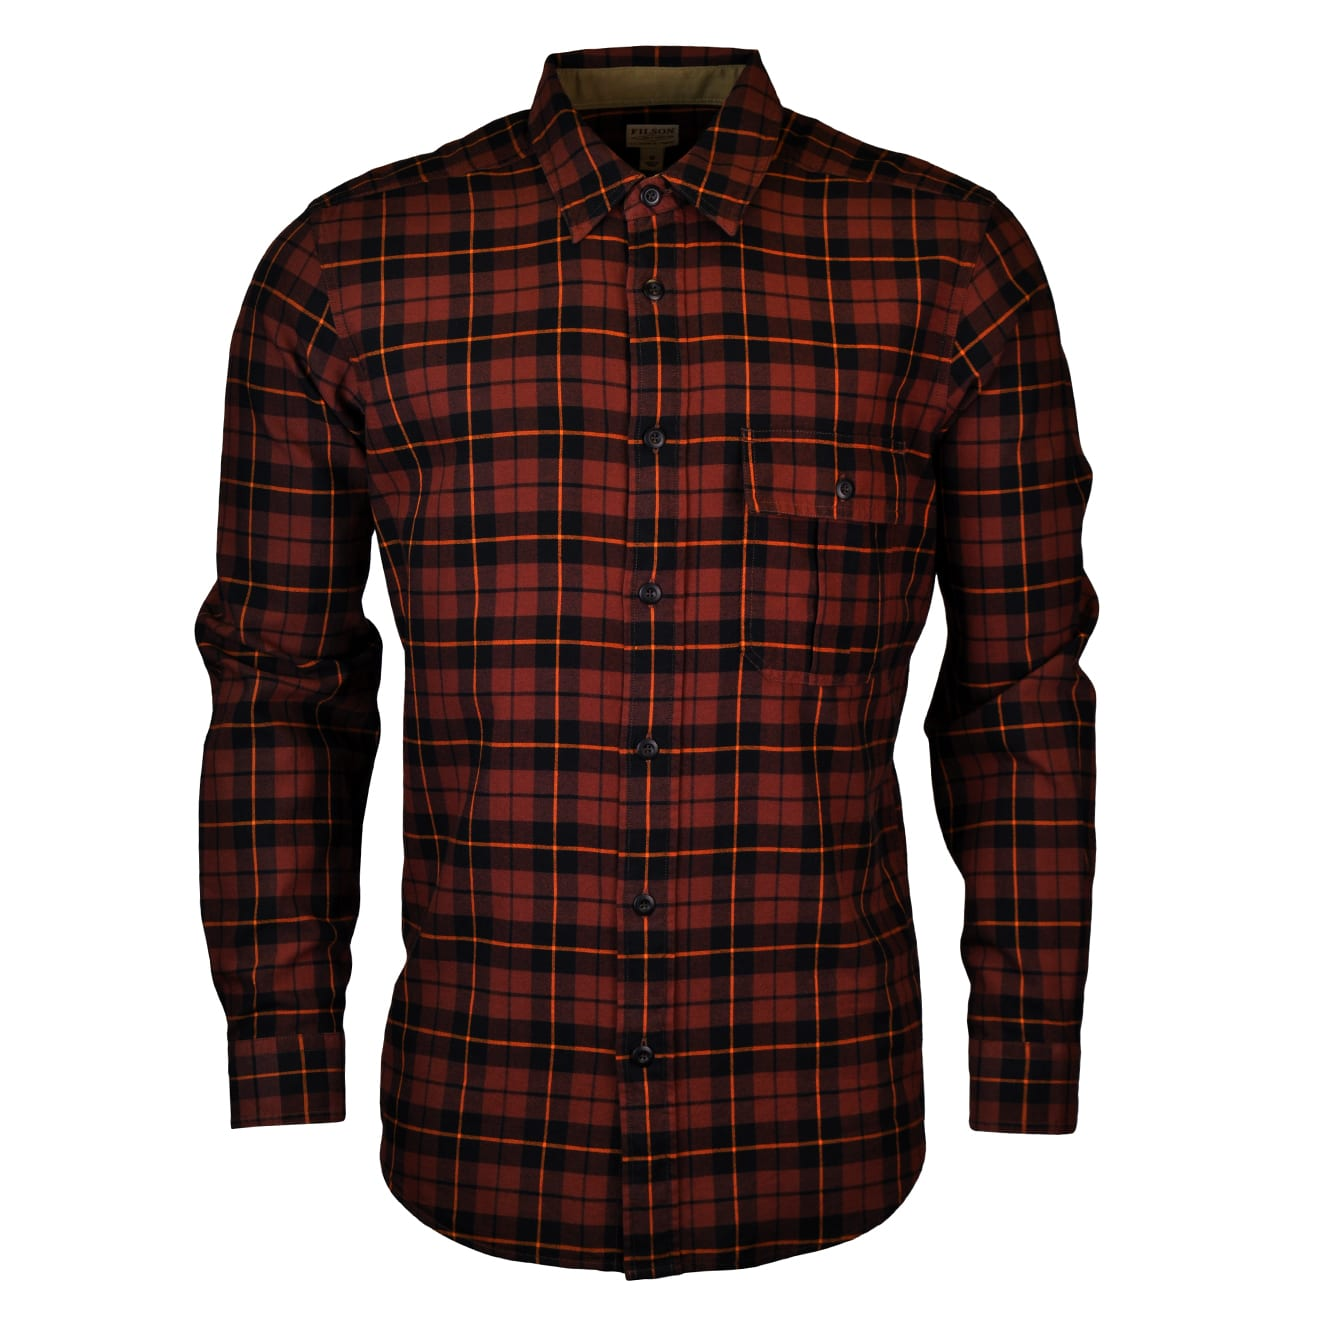 Filson Rustic oxford shirt copper black